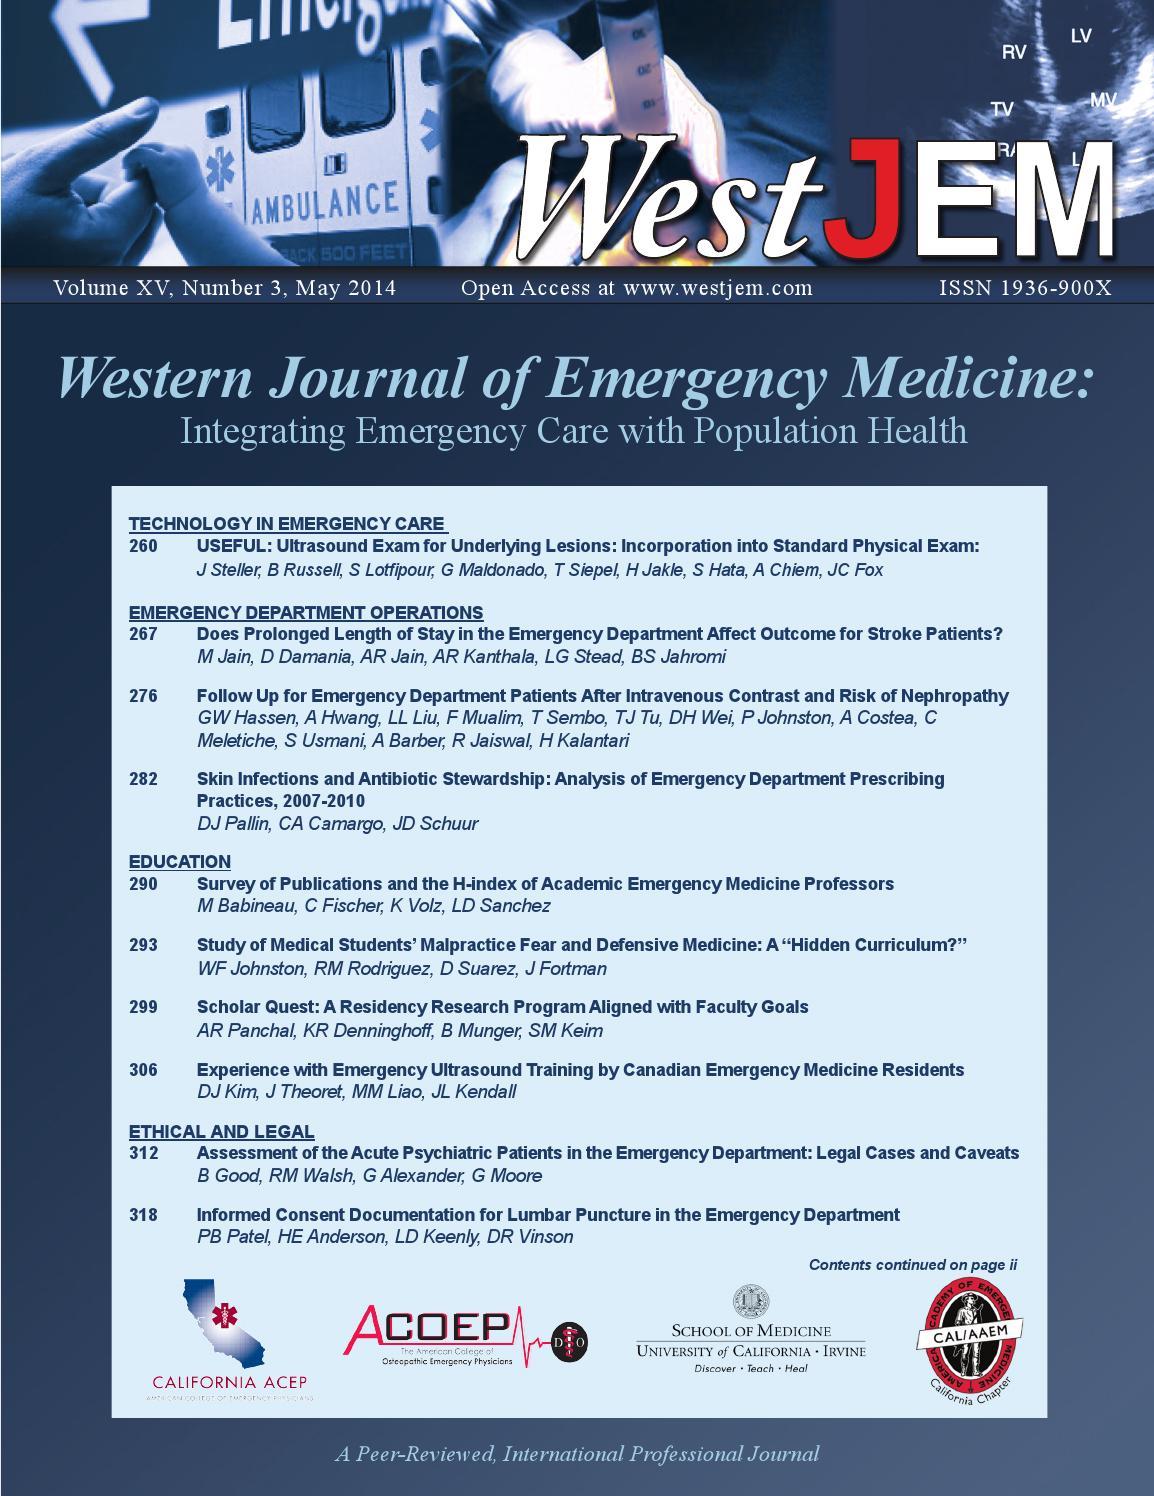 Volume 15, Issue 3 by Western Journal of Emergency Medicine